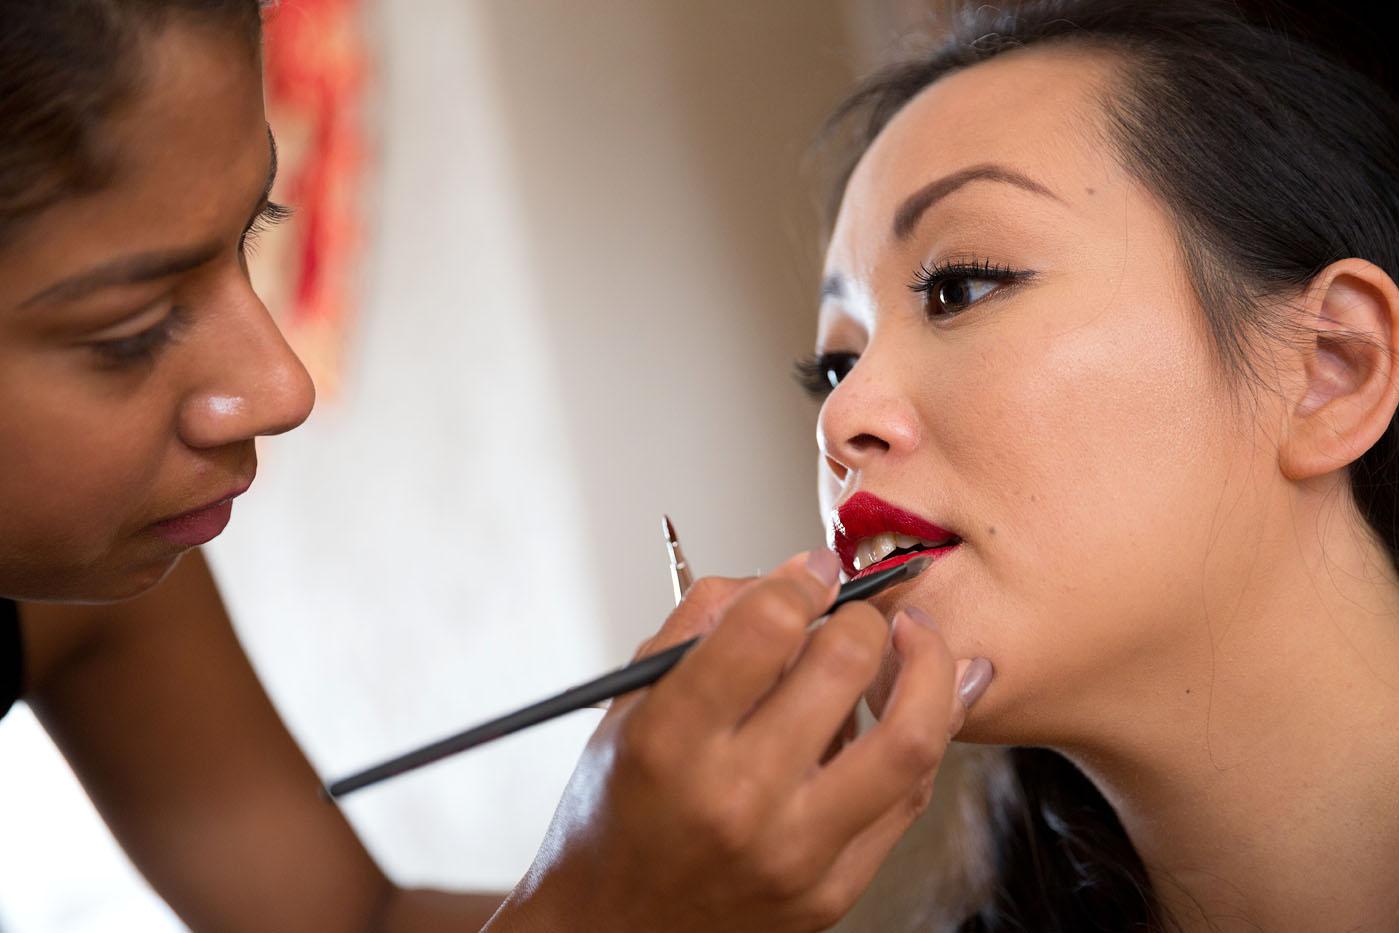 bruiloft-wedding-trouwen-fotograaf-chinees-bobhersbach-rotterdam-makeup